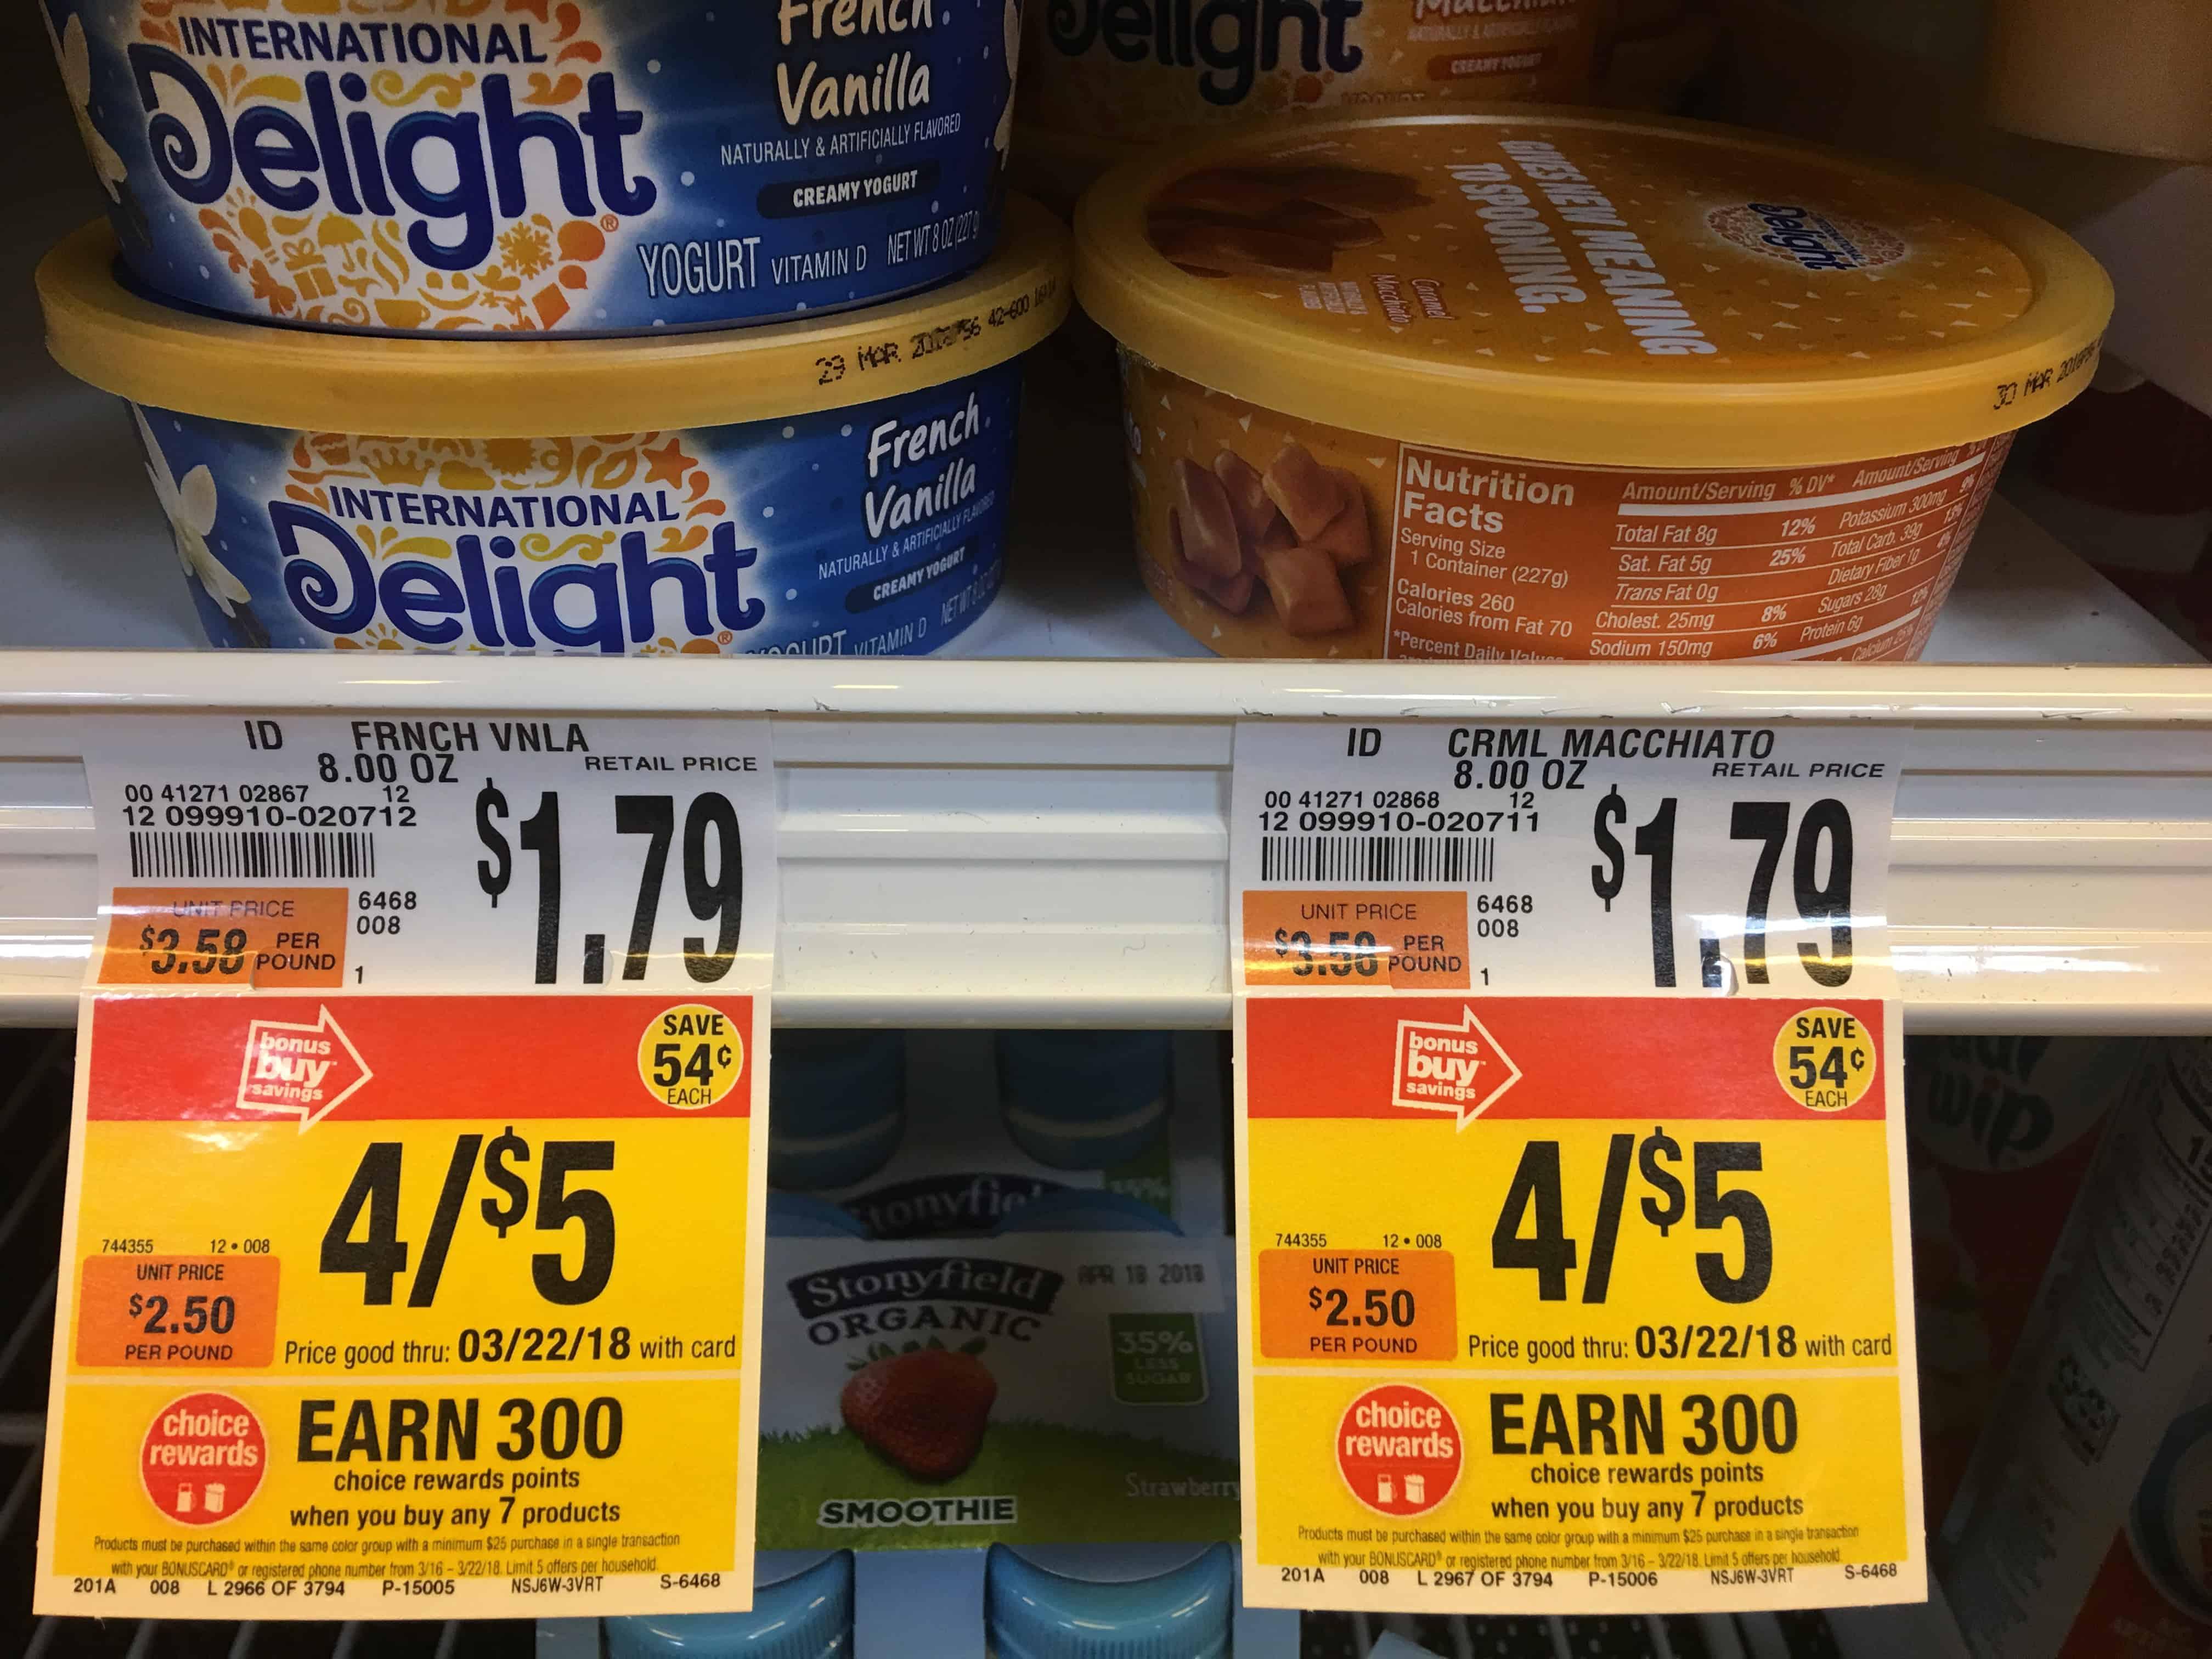 International Delight Yogurts